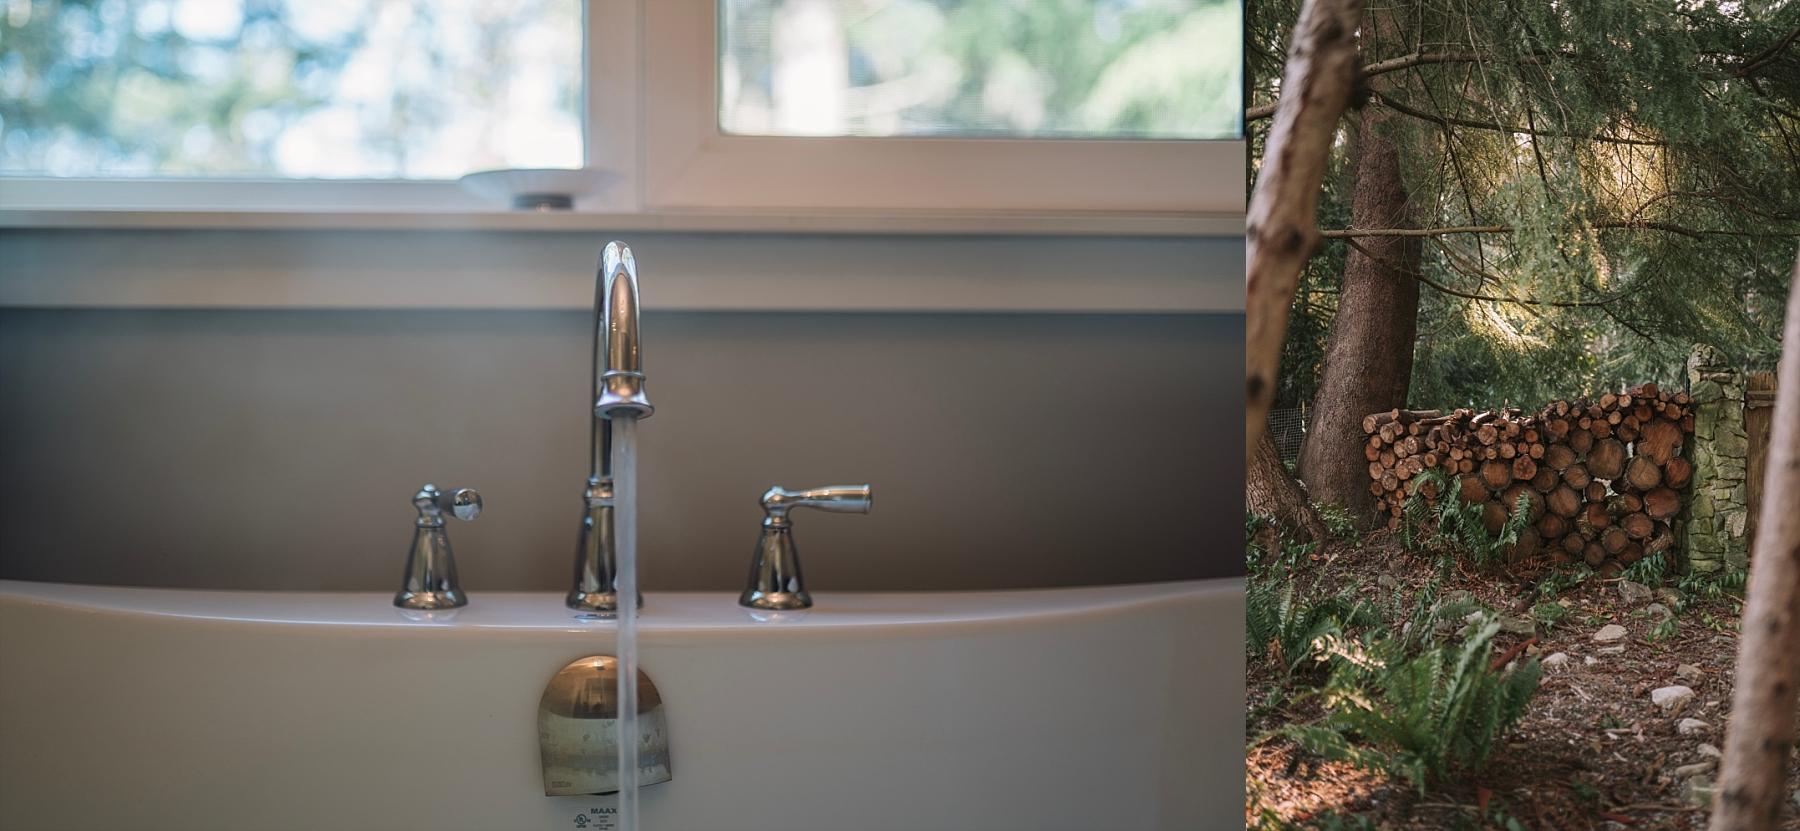 airbnb soaker tub